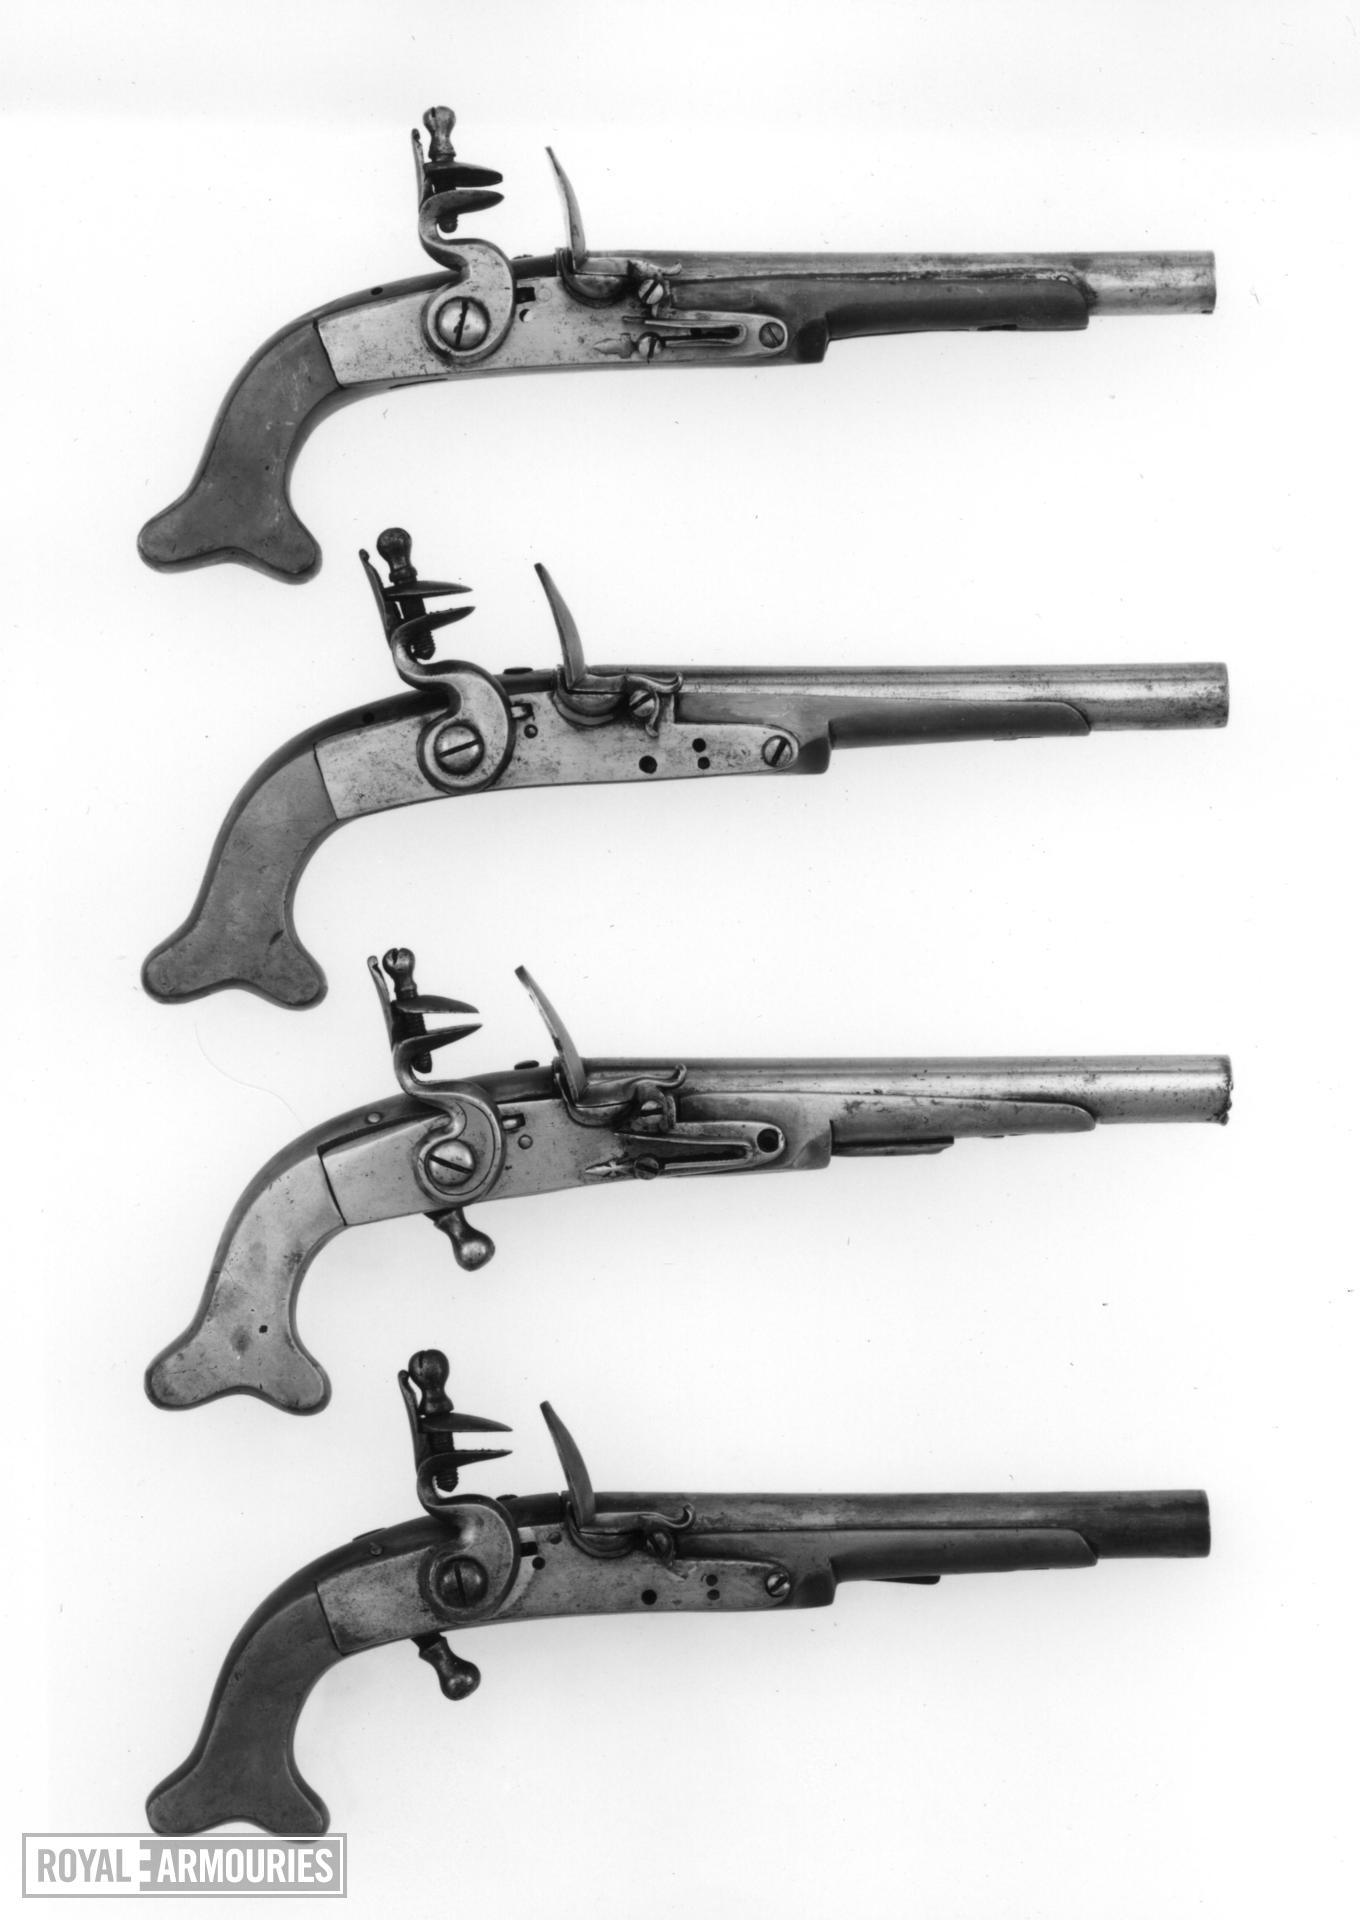 Flintlock military pistol